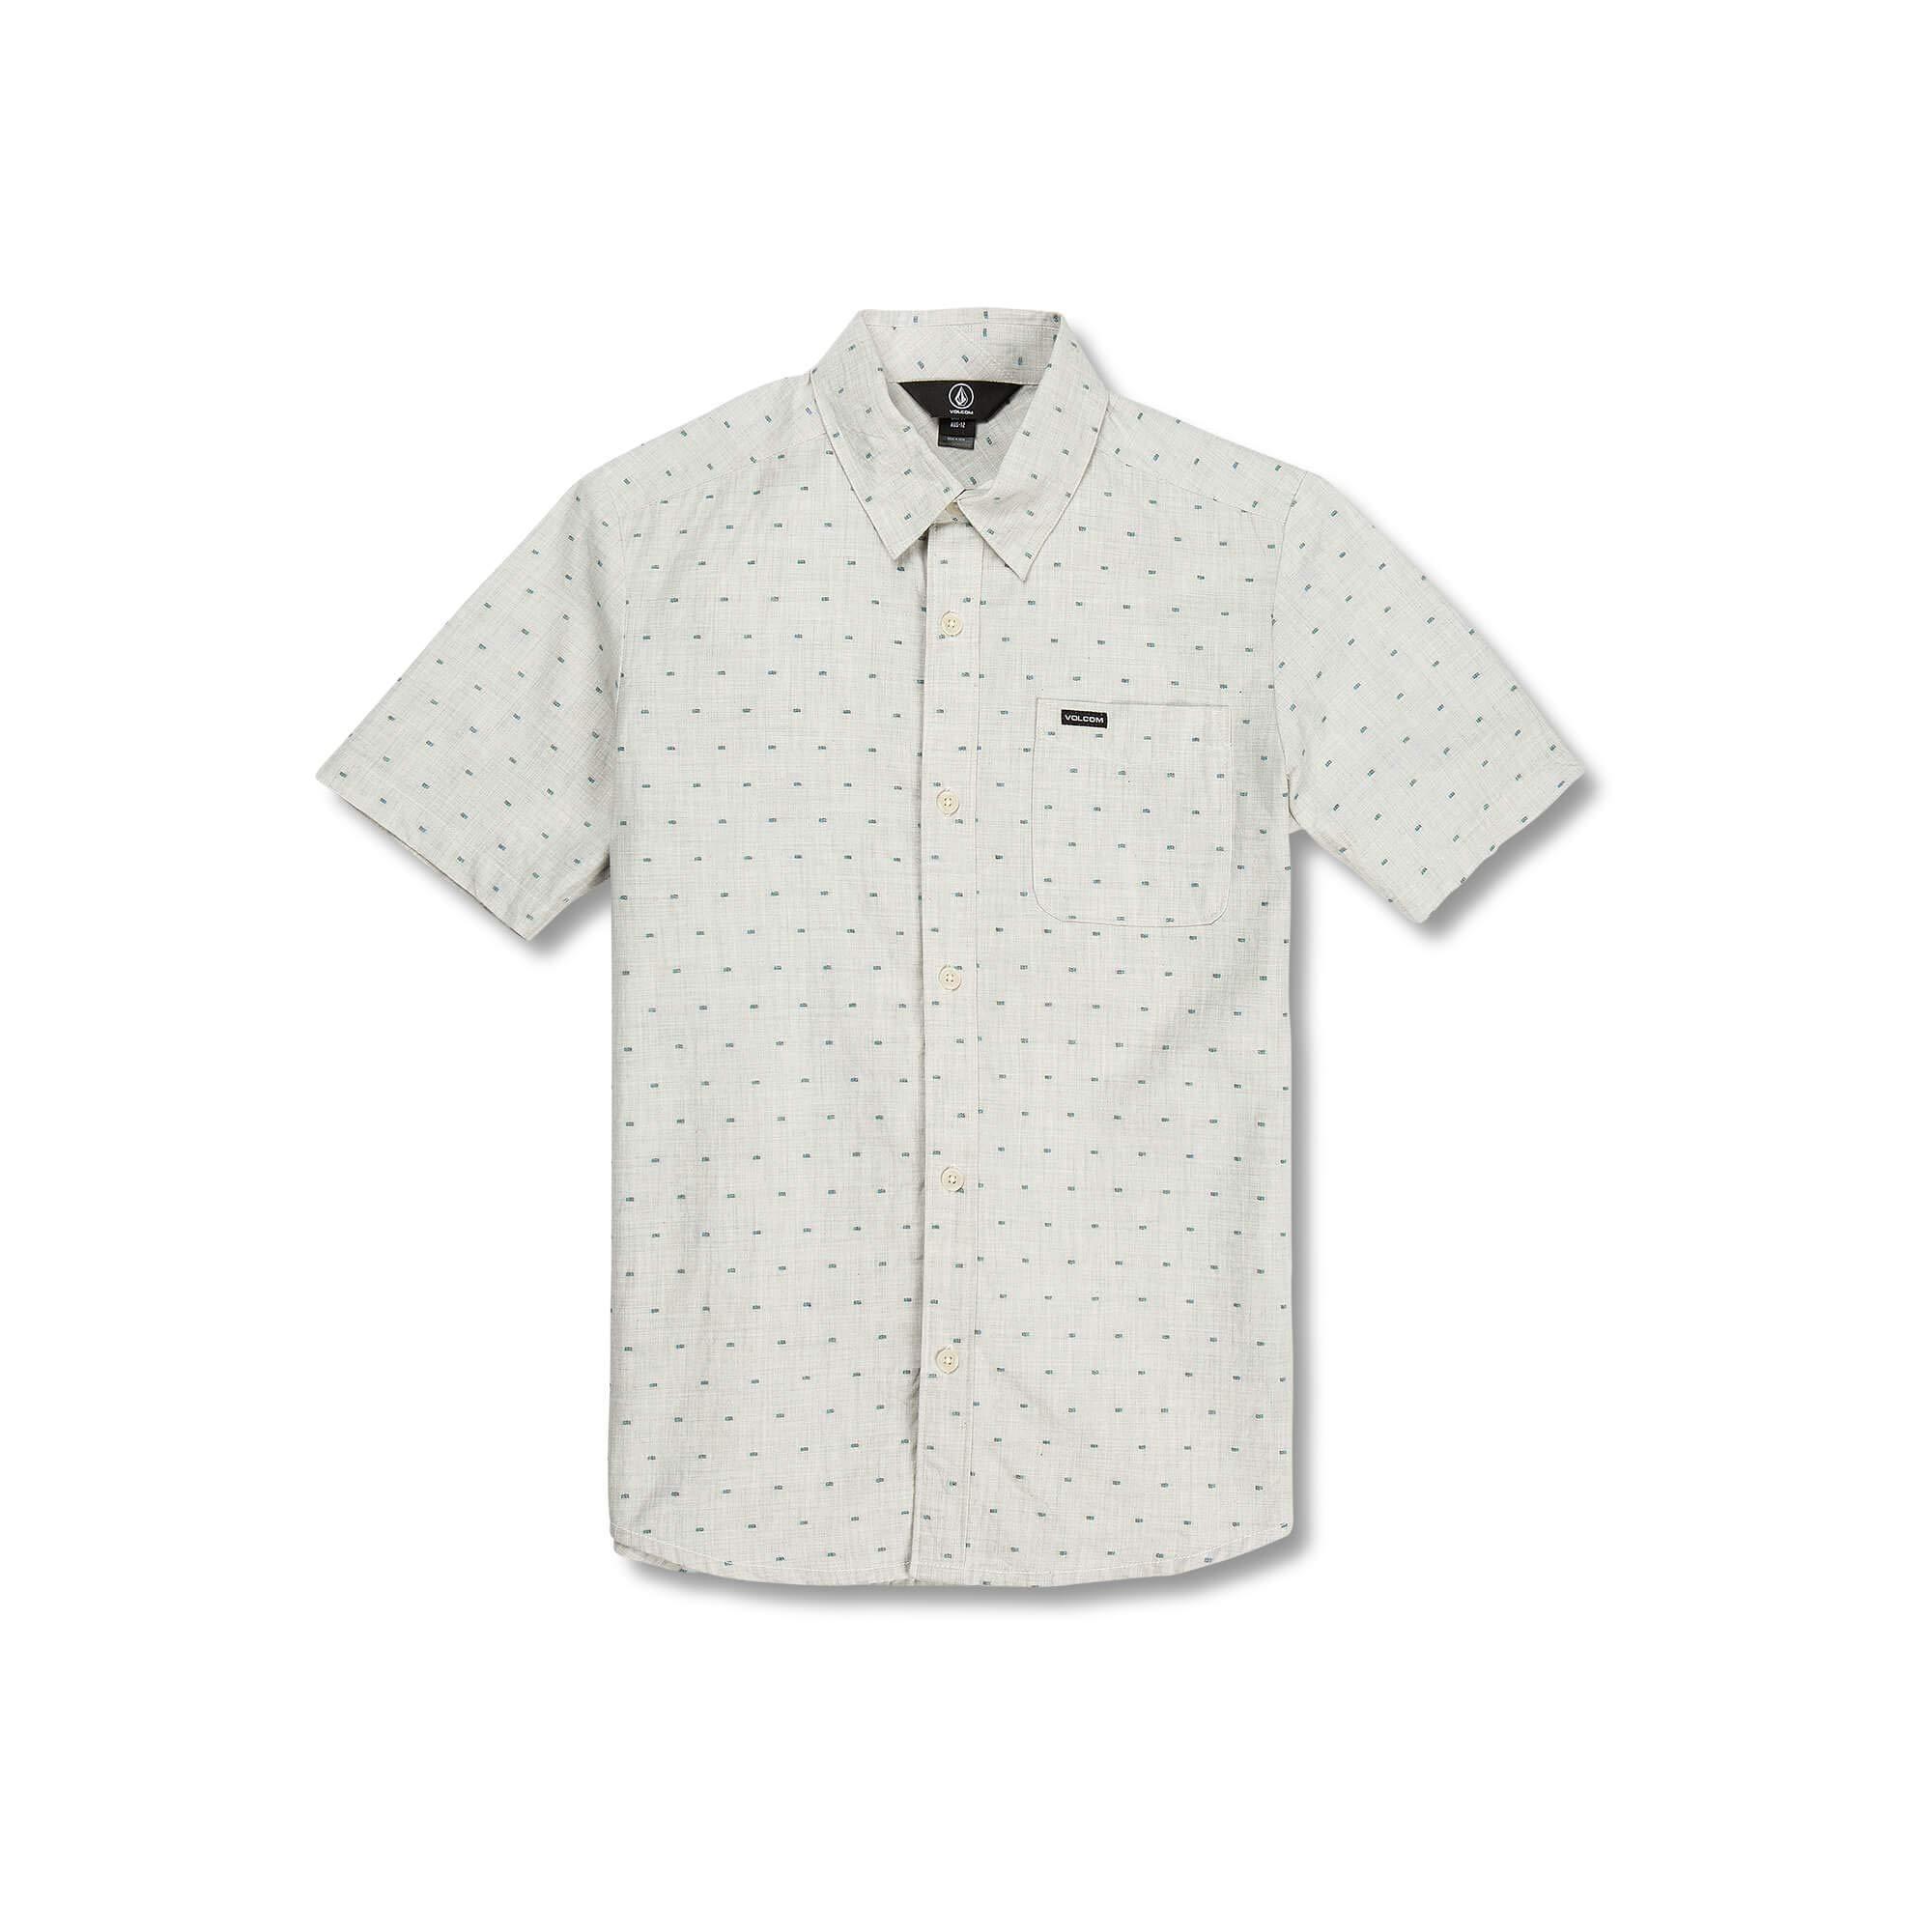 Volcom Big Boys Mark Mix Modern Fit Short Sleeve Button Up Shirt, White Flash, Medium